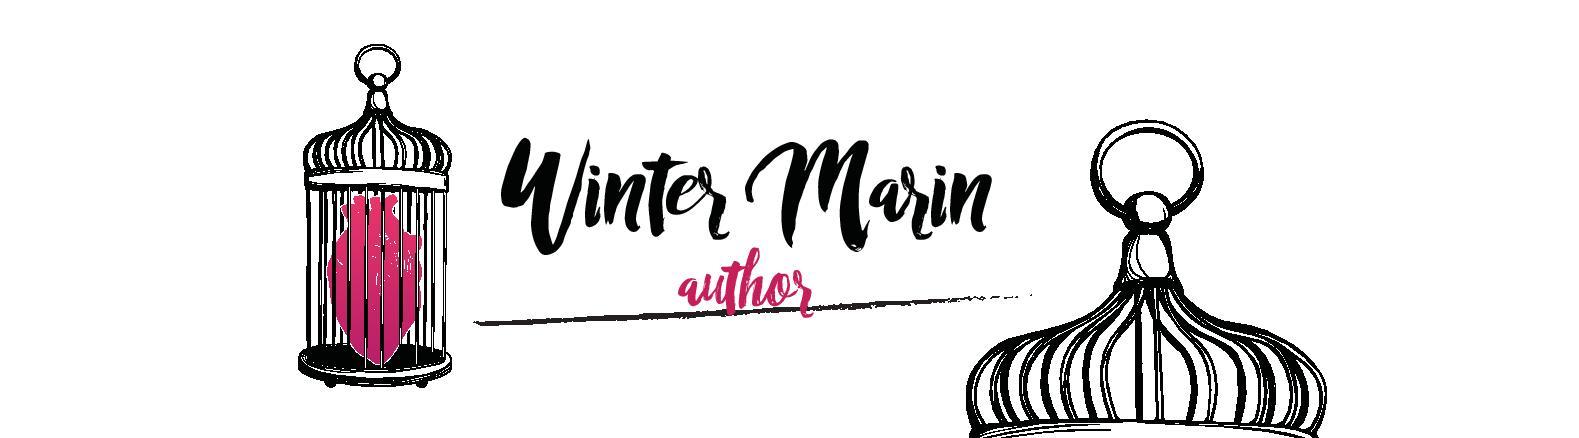 VW Marin Website Banner